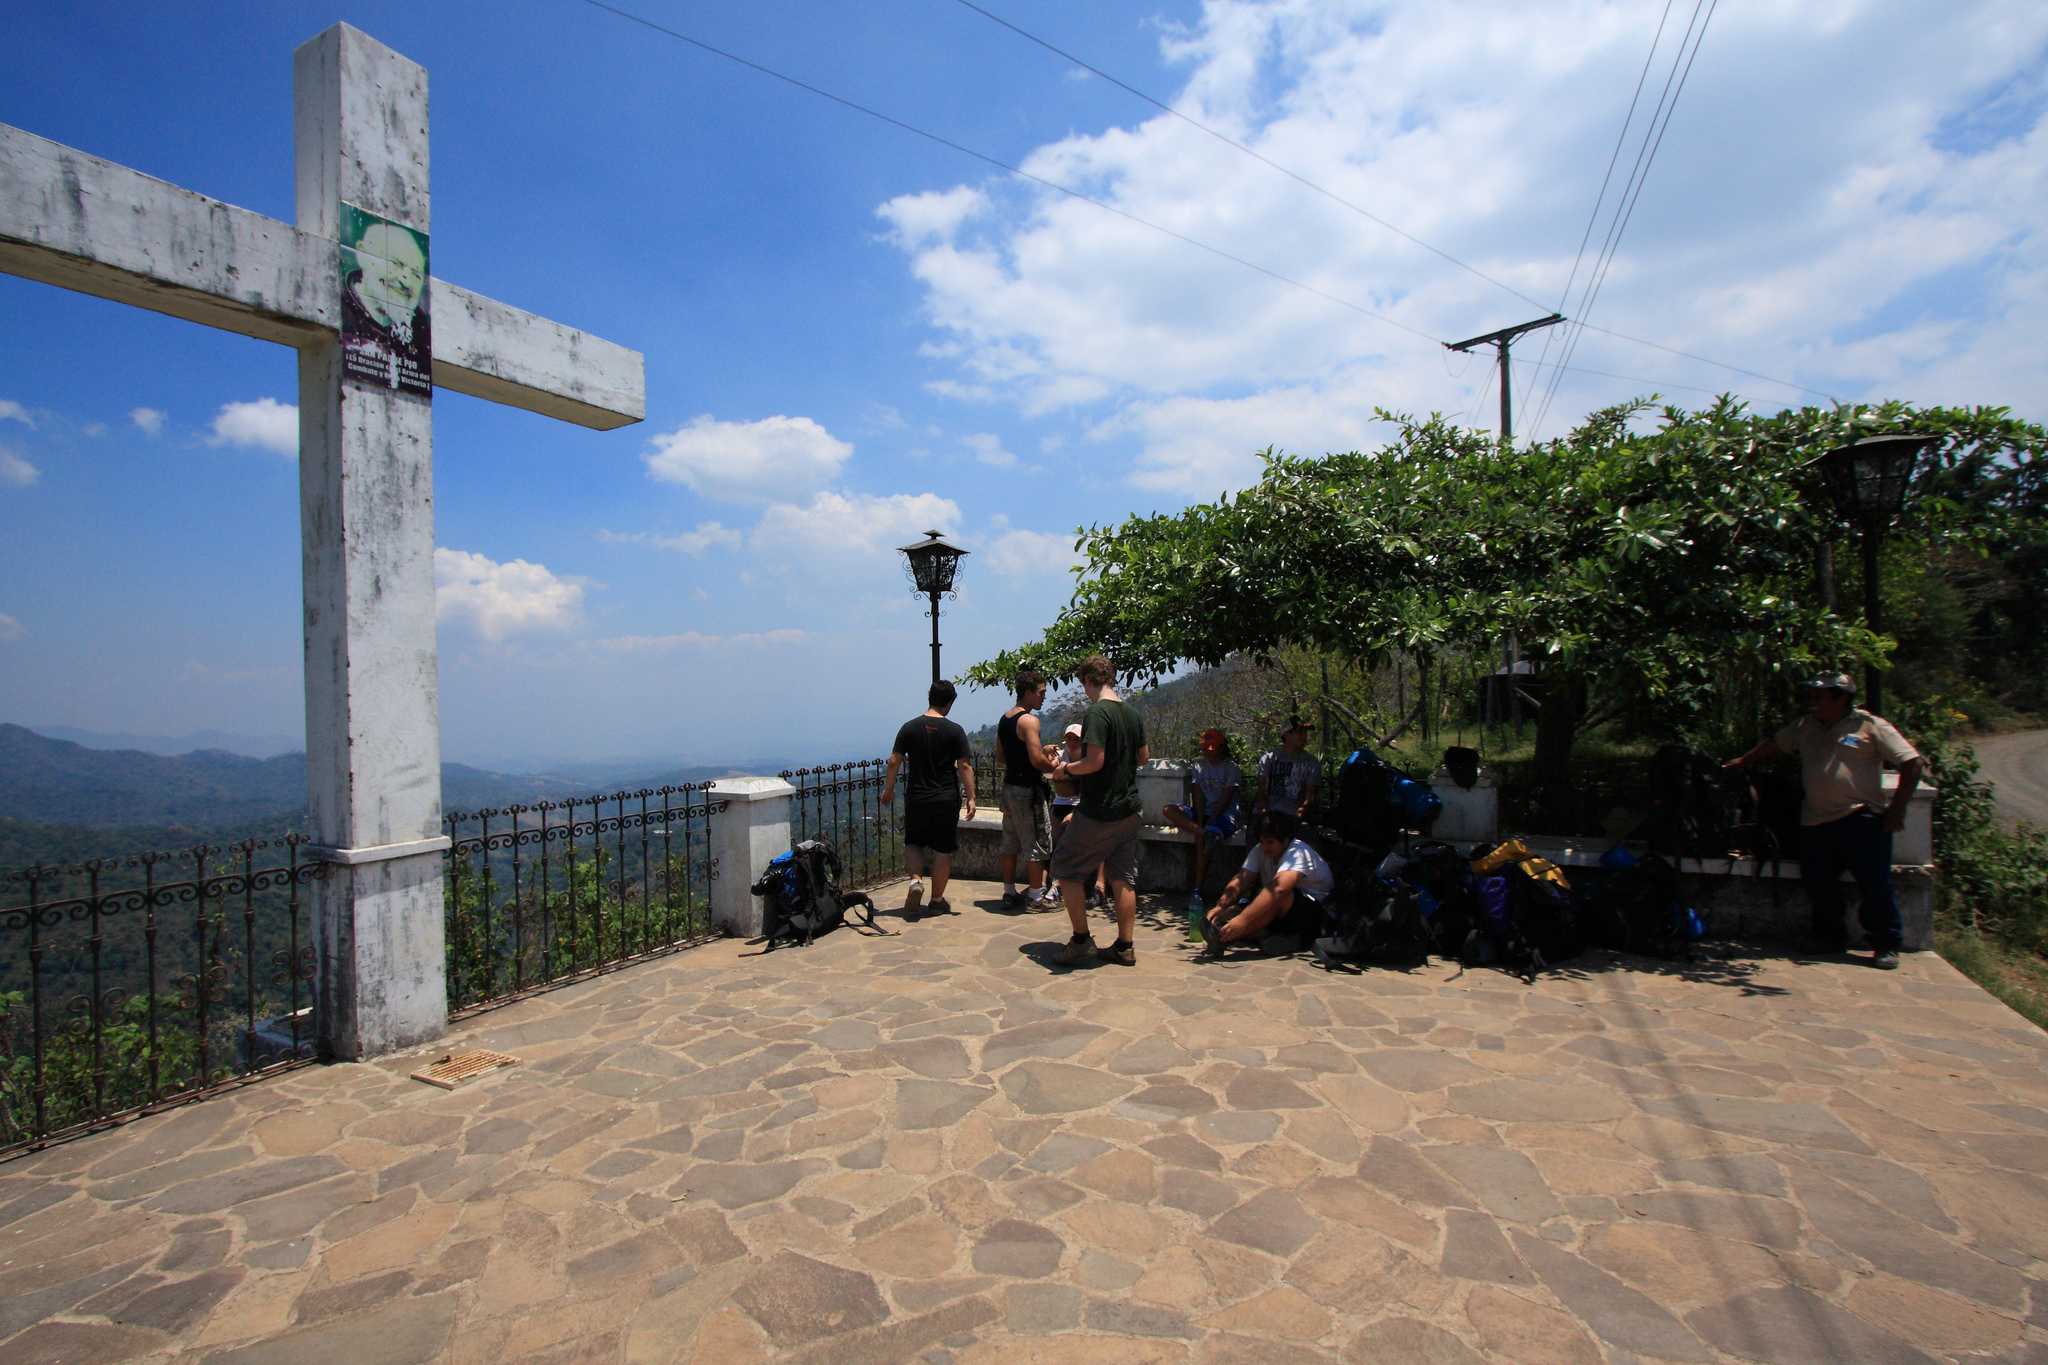 Ataco viewpoint